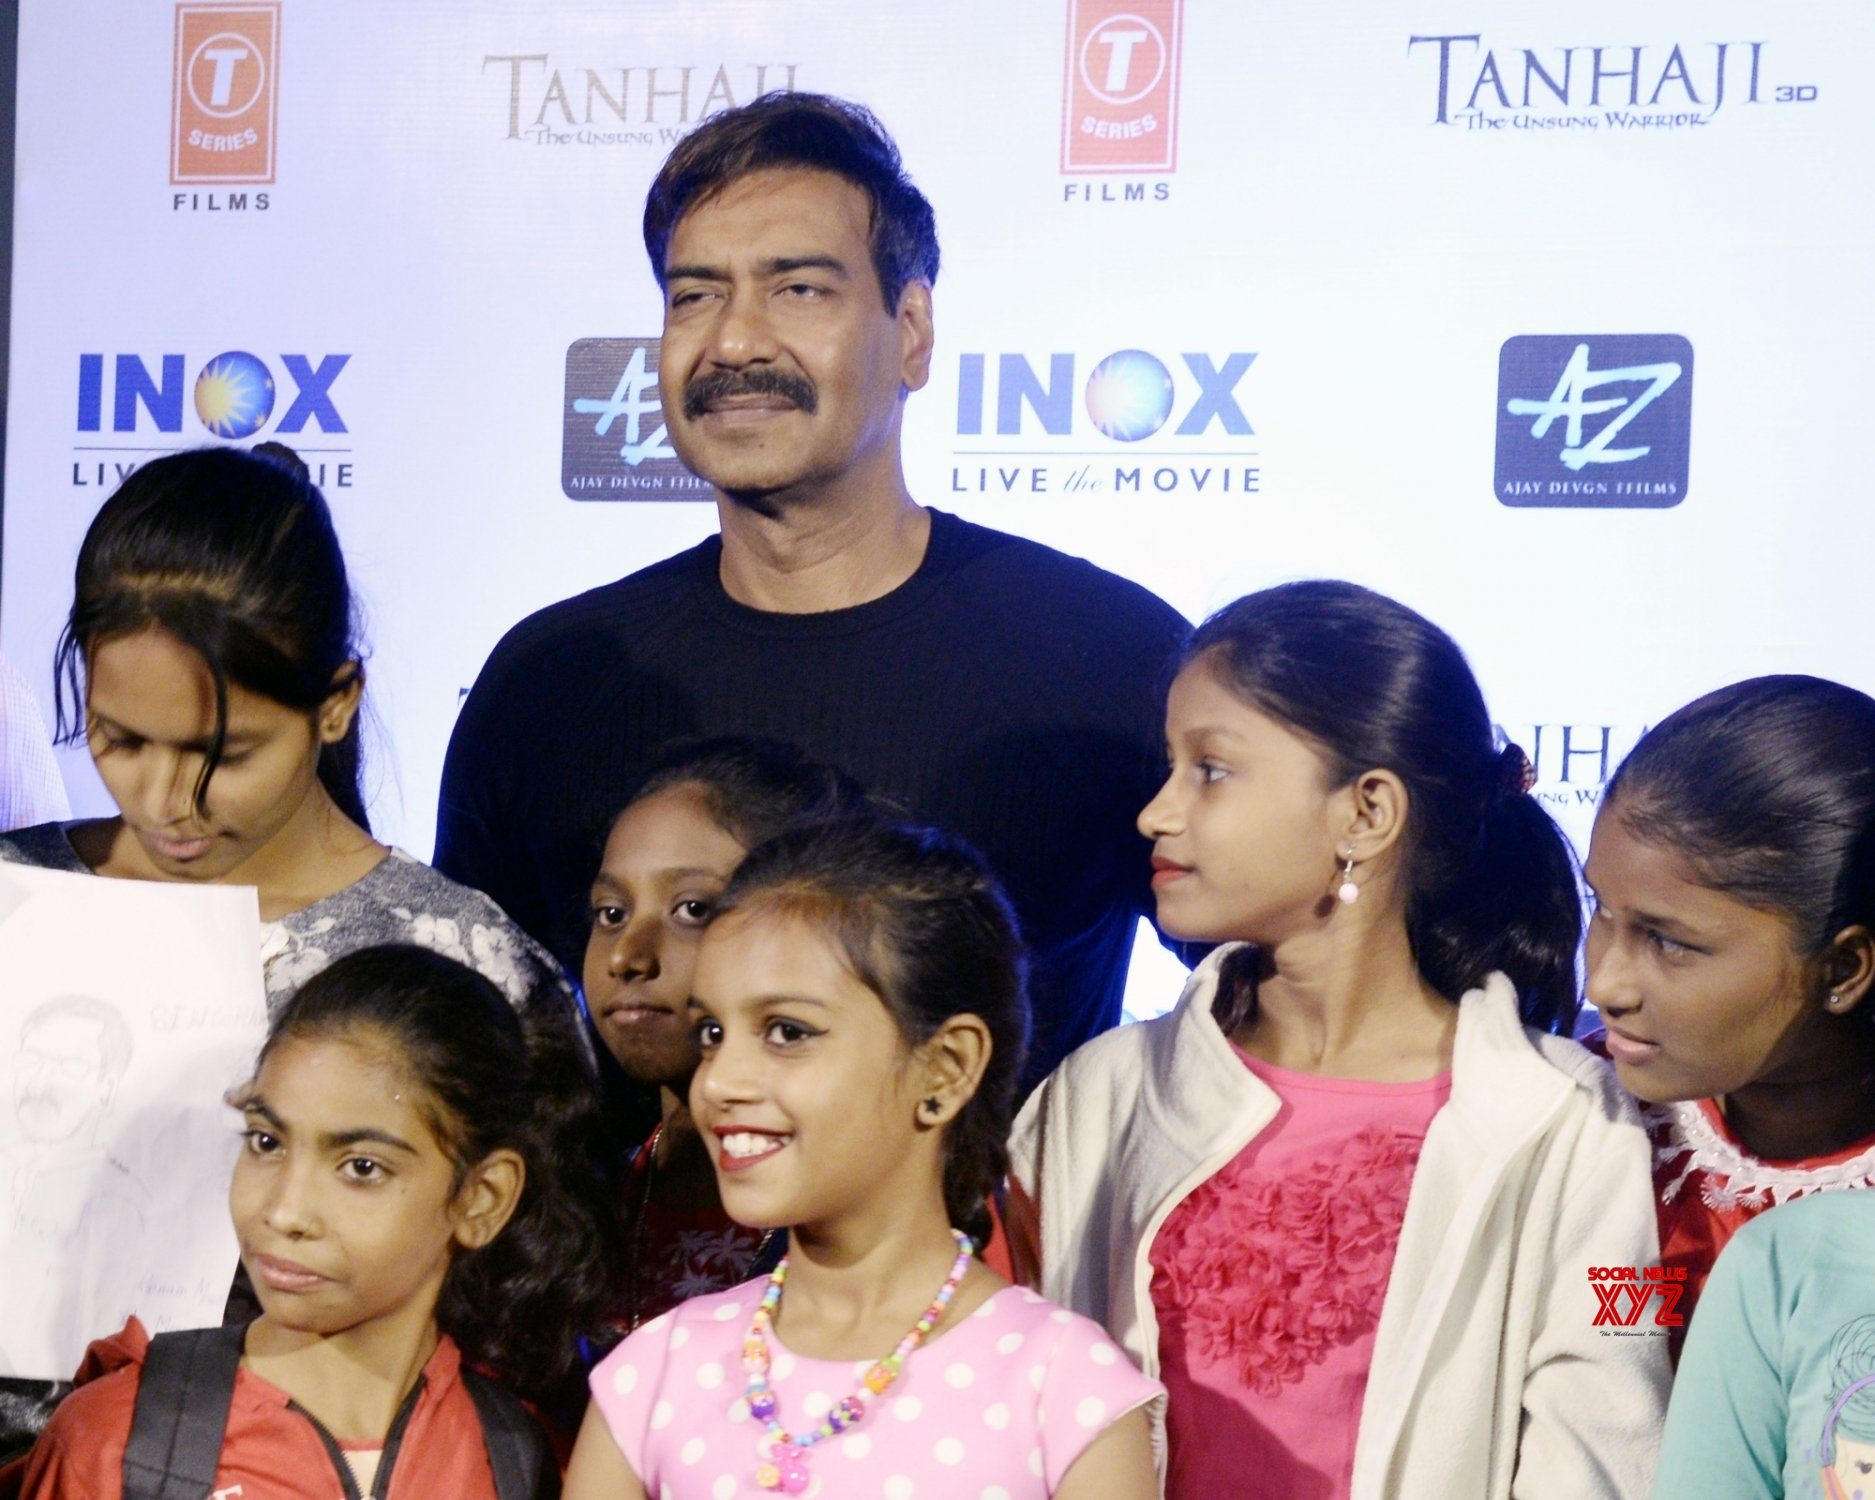 Kolkata: 'Tanhaji: The Unsung Warrior' - Promotion #Gallery